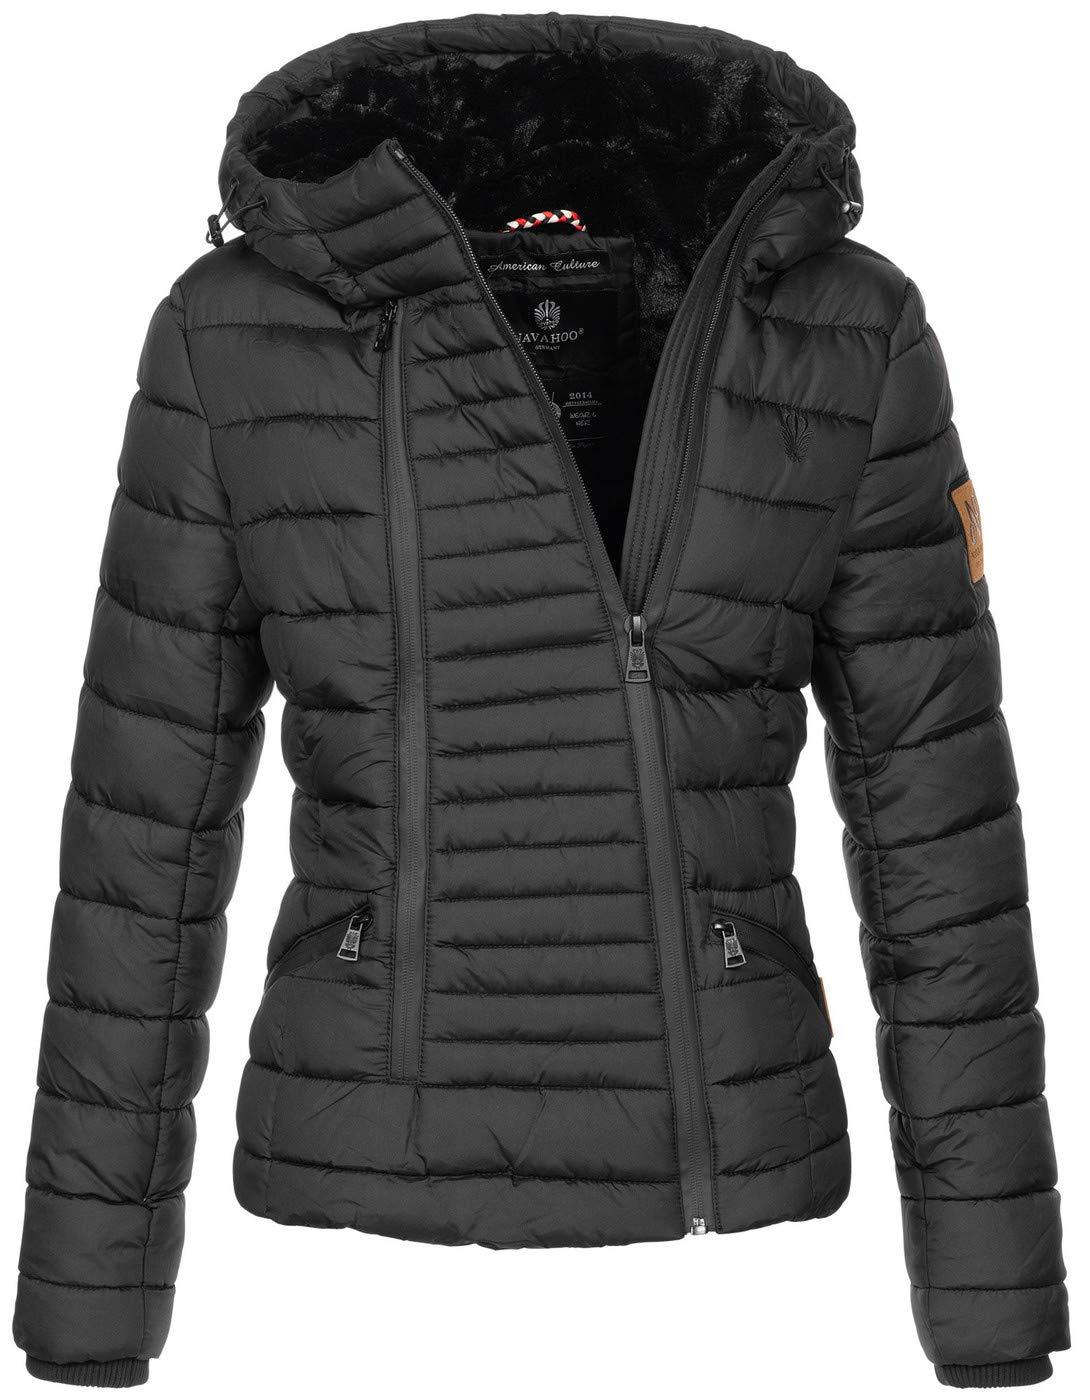 Navahoo Damen Designer Winter Jacke warme Winterjacke Steppjacke Teddyfell B656